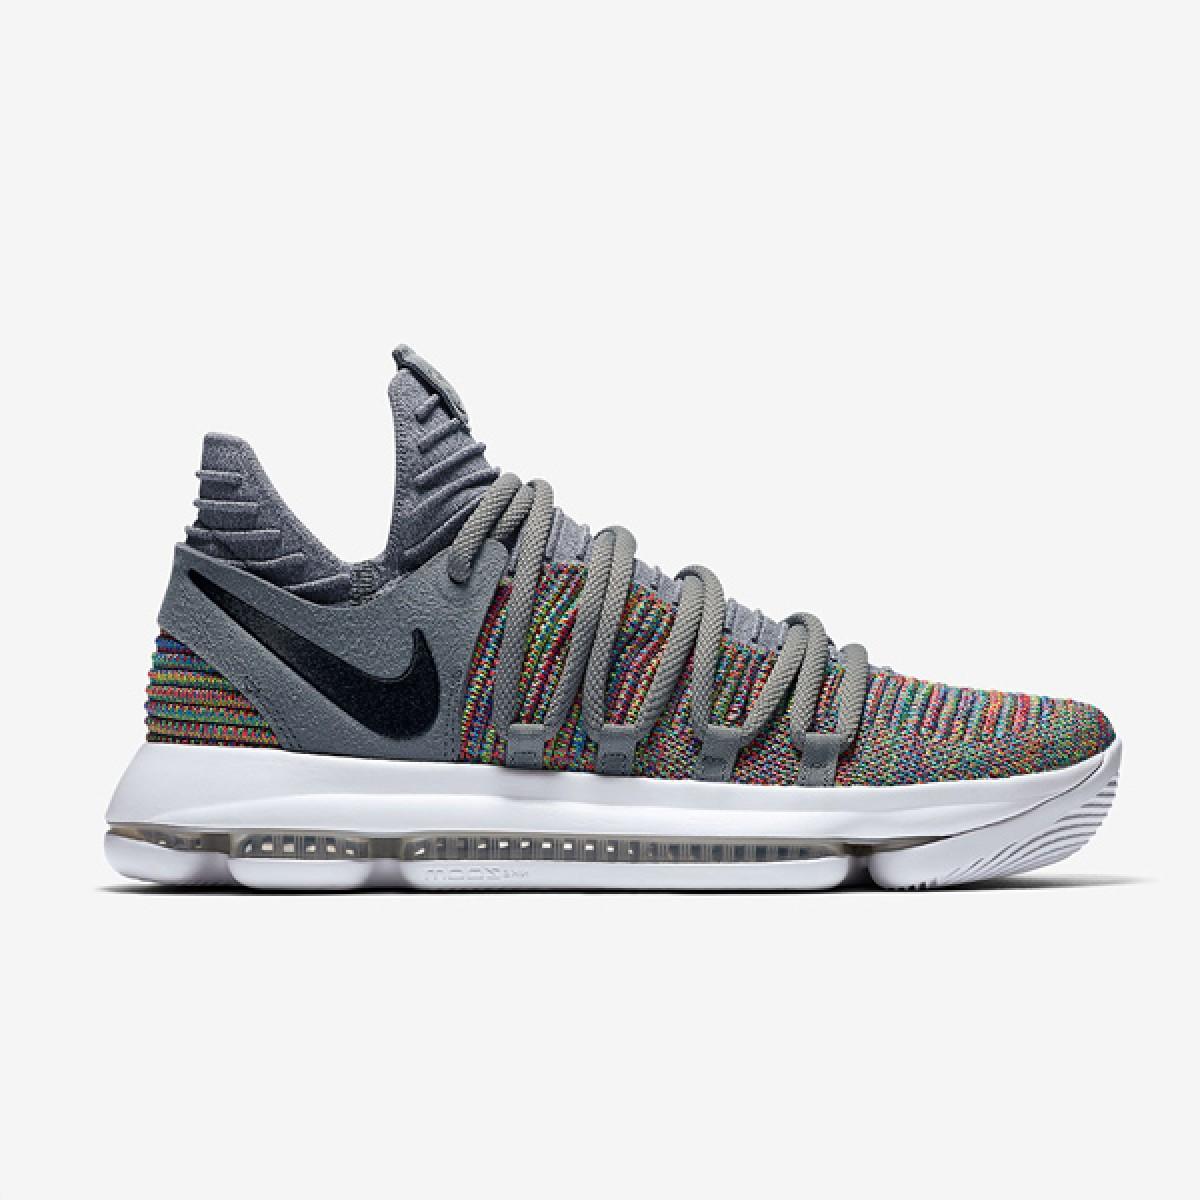 Nike Zoom KD 10 'Multicolor'